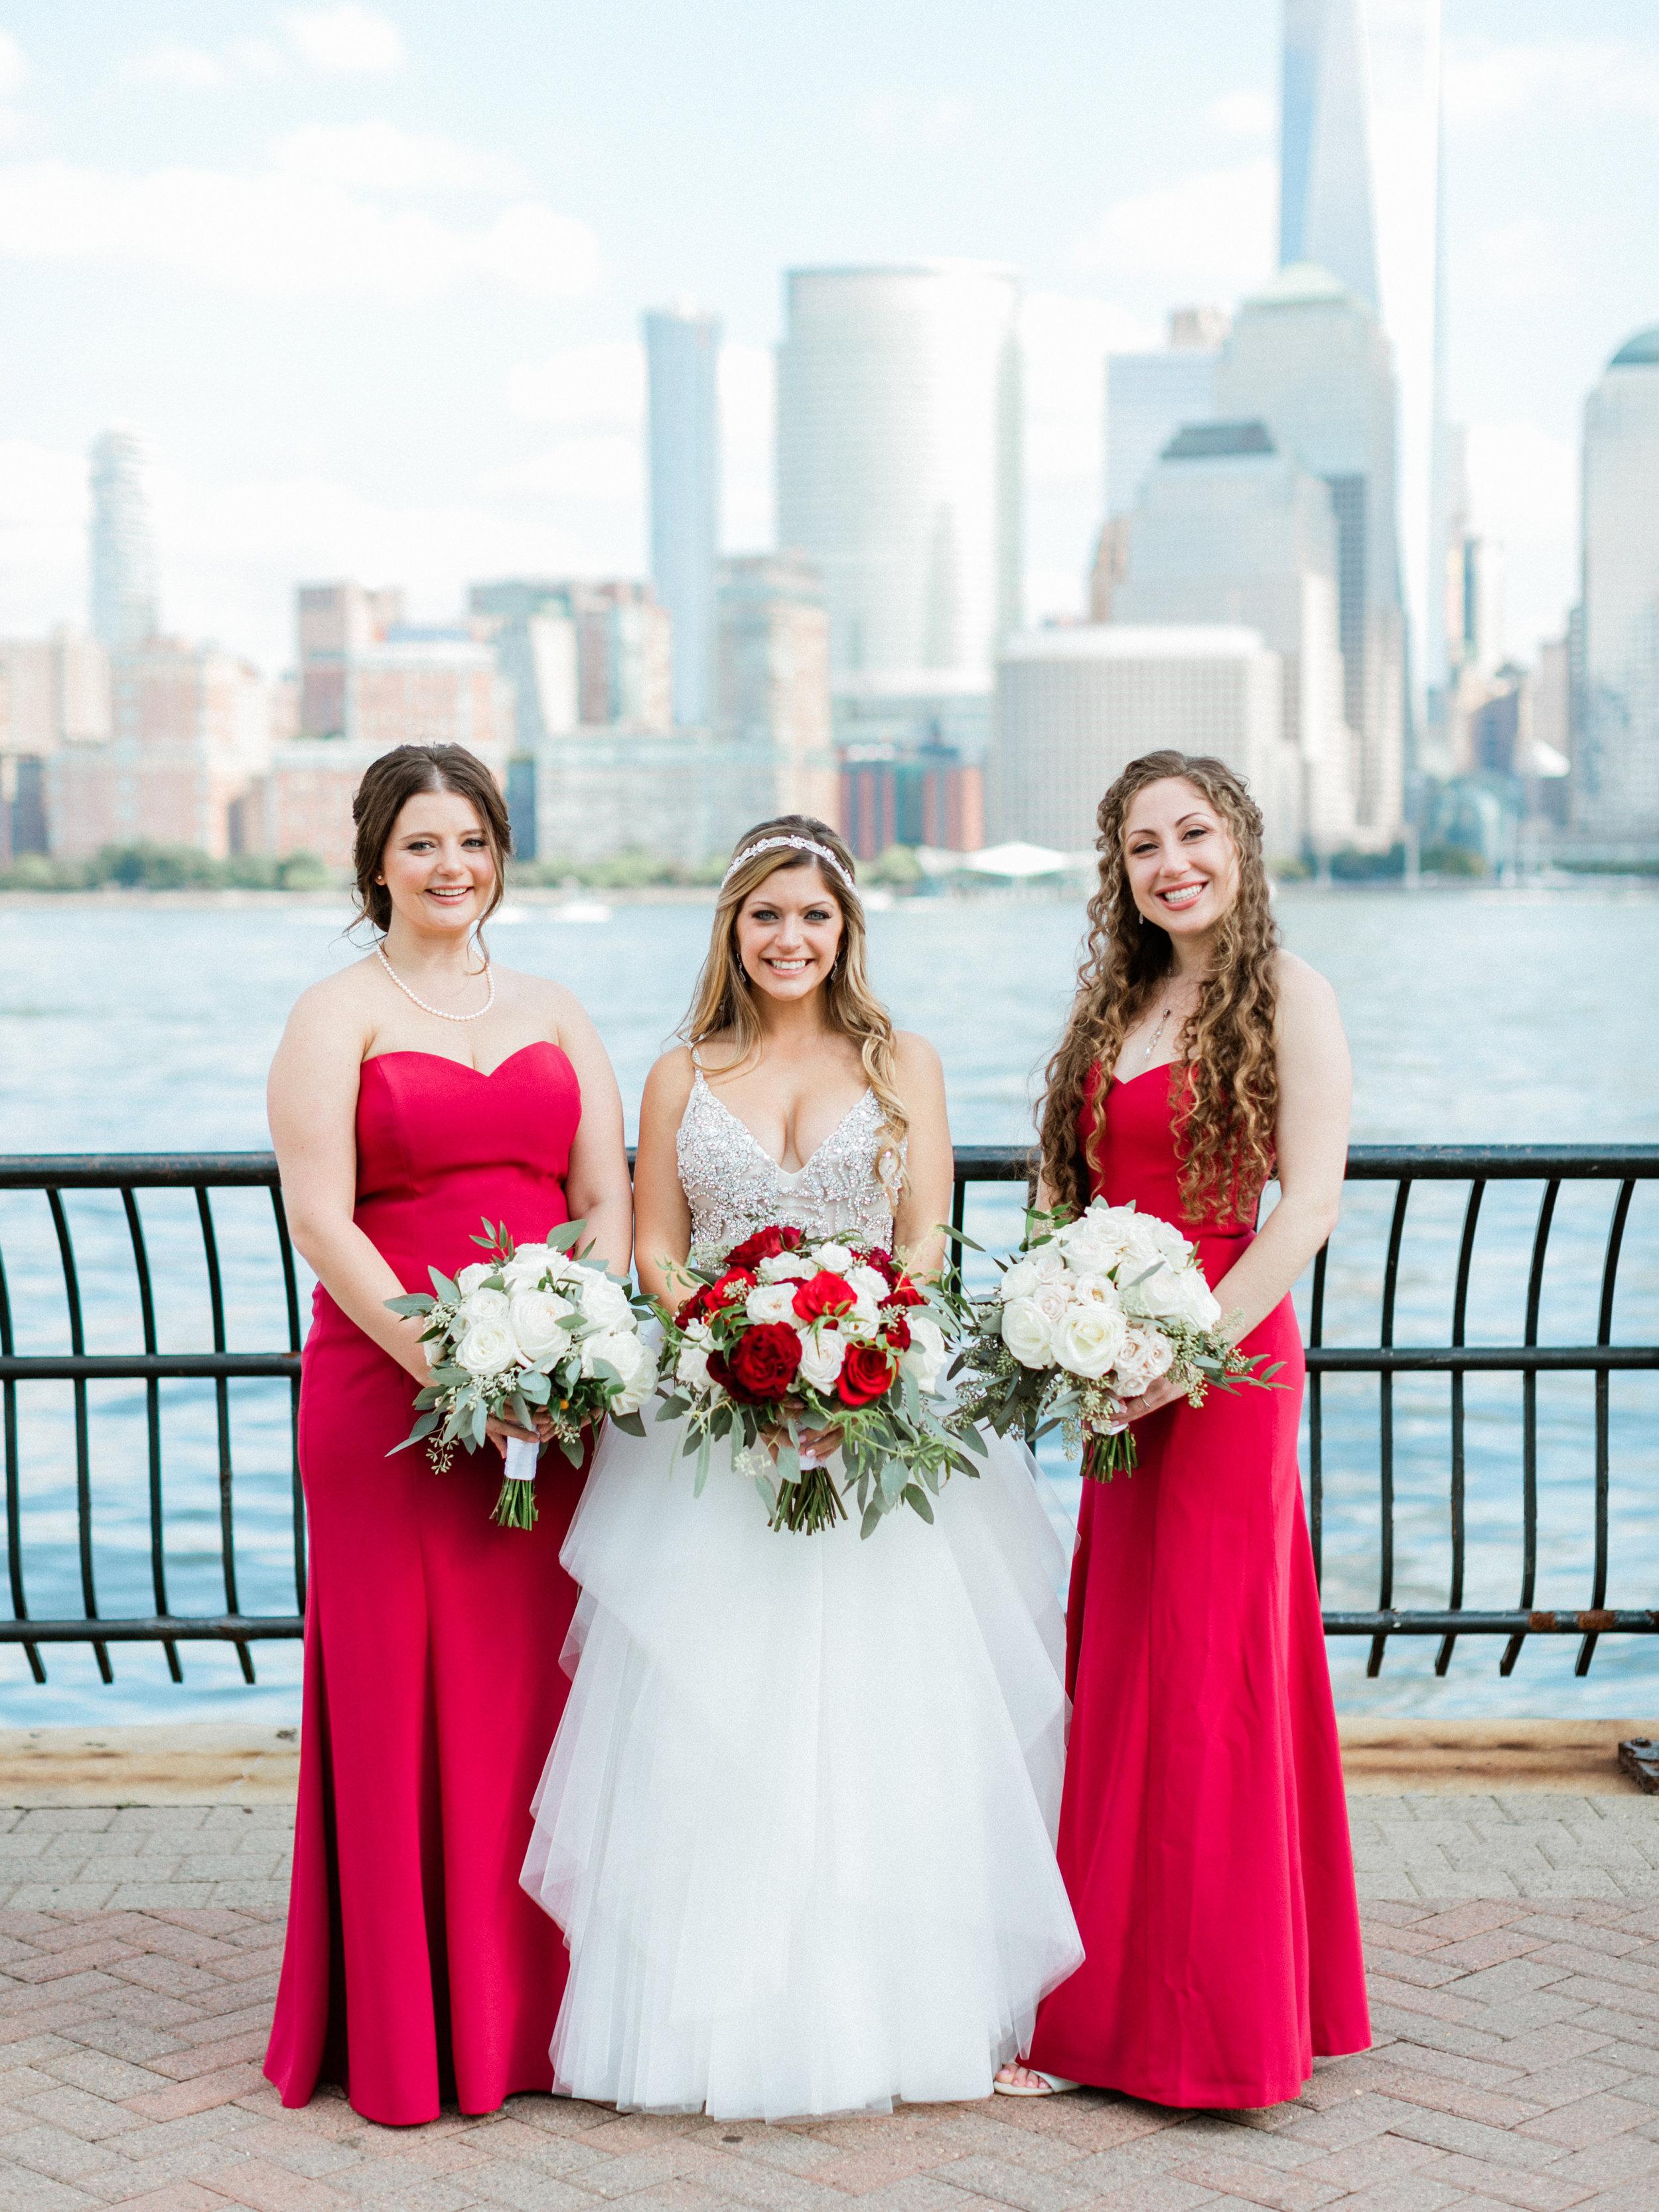 hyatt-regency-jersey-city-wedding-photographer28.jpg